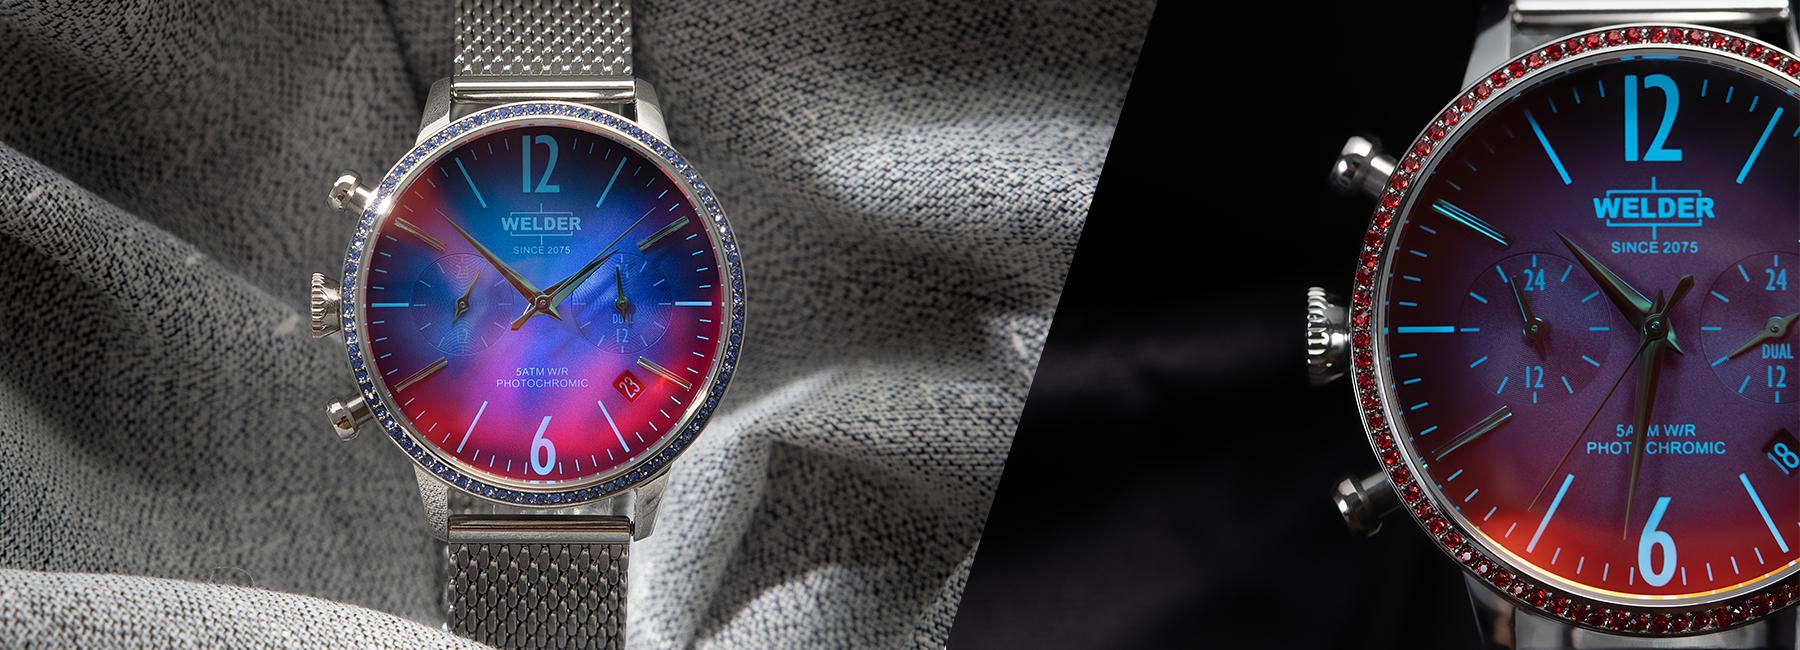 Welder Wristwatch Selection for 8 March International Women's Day